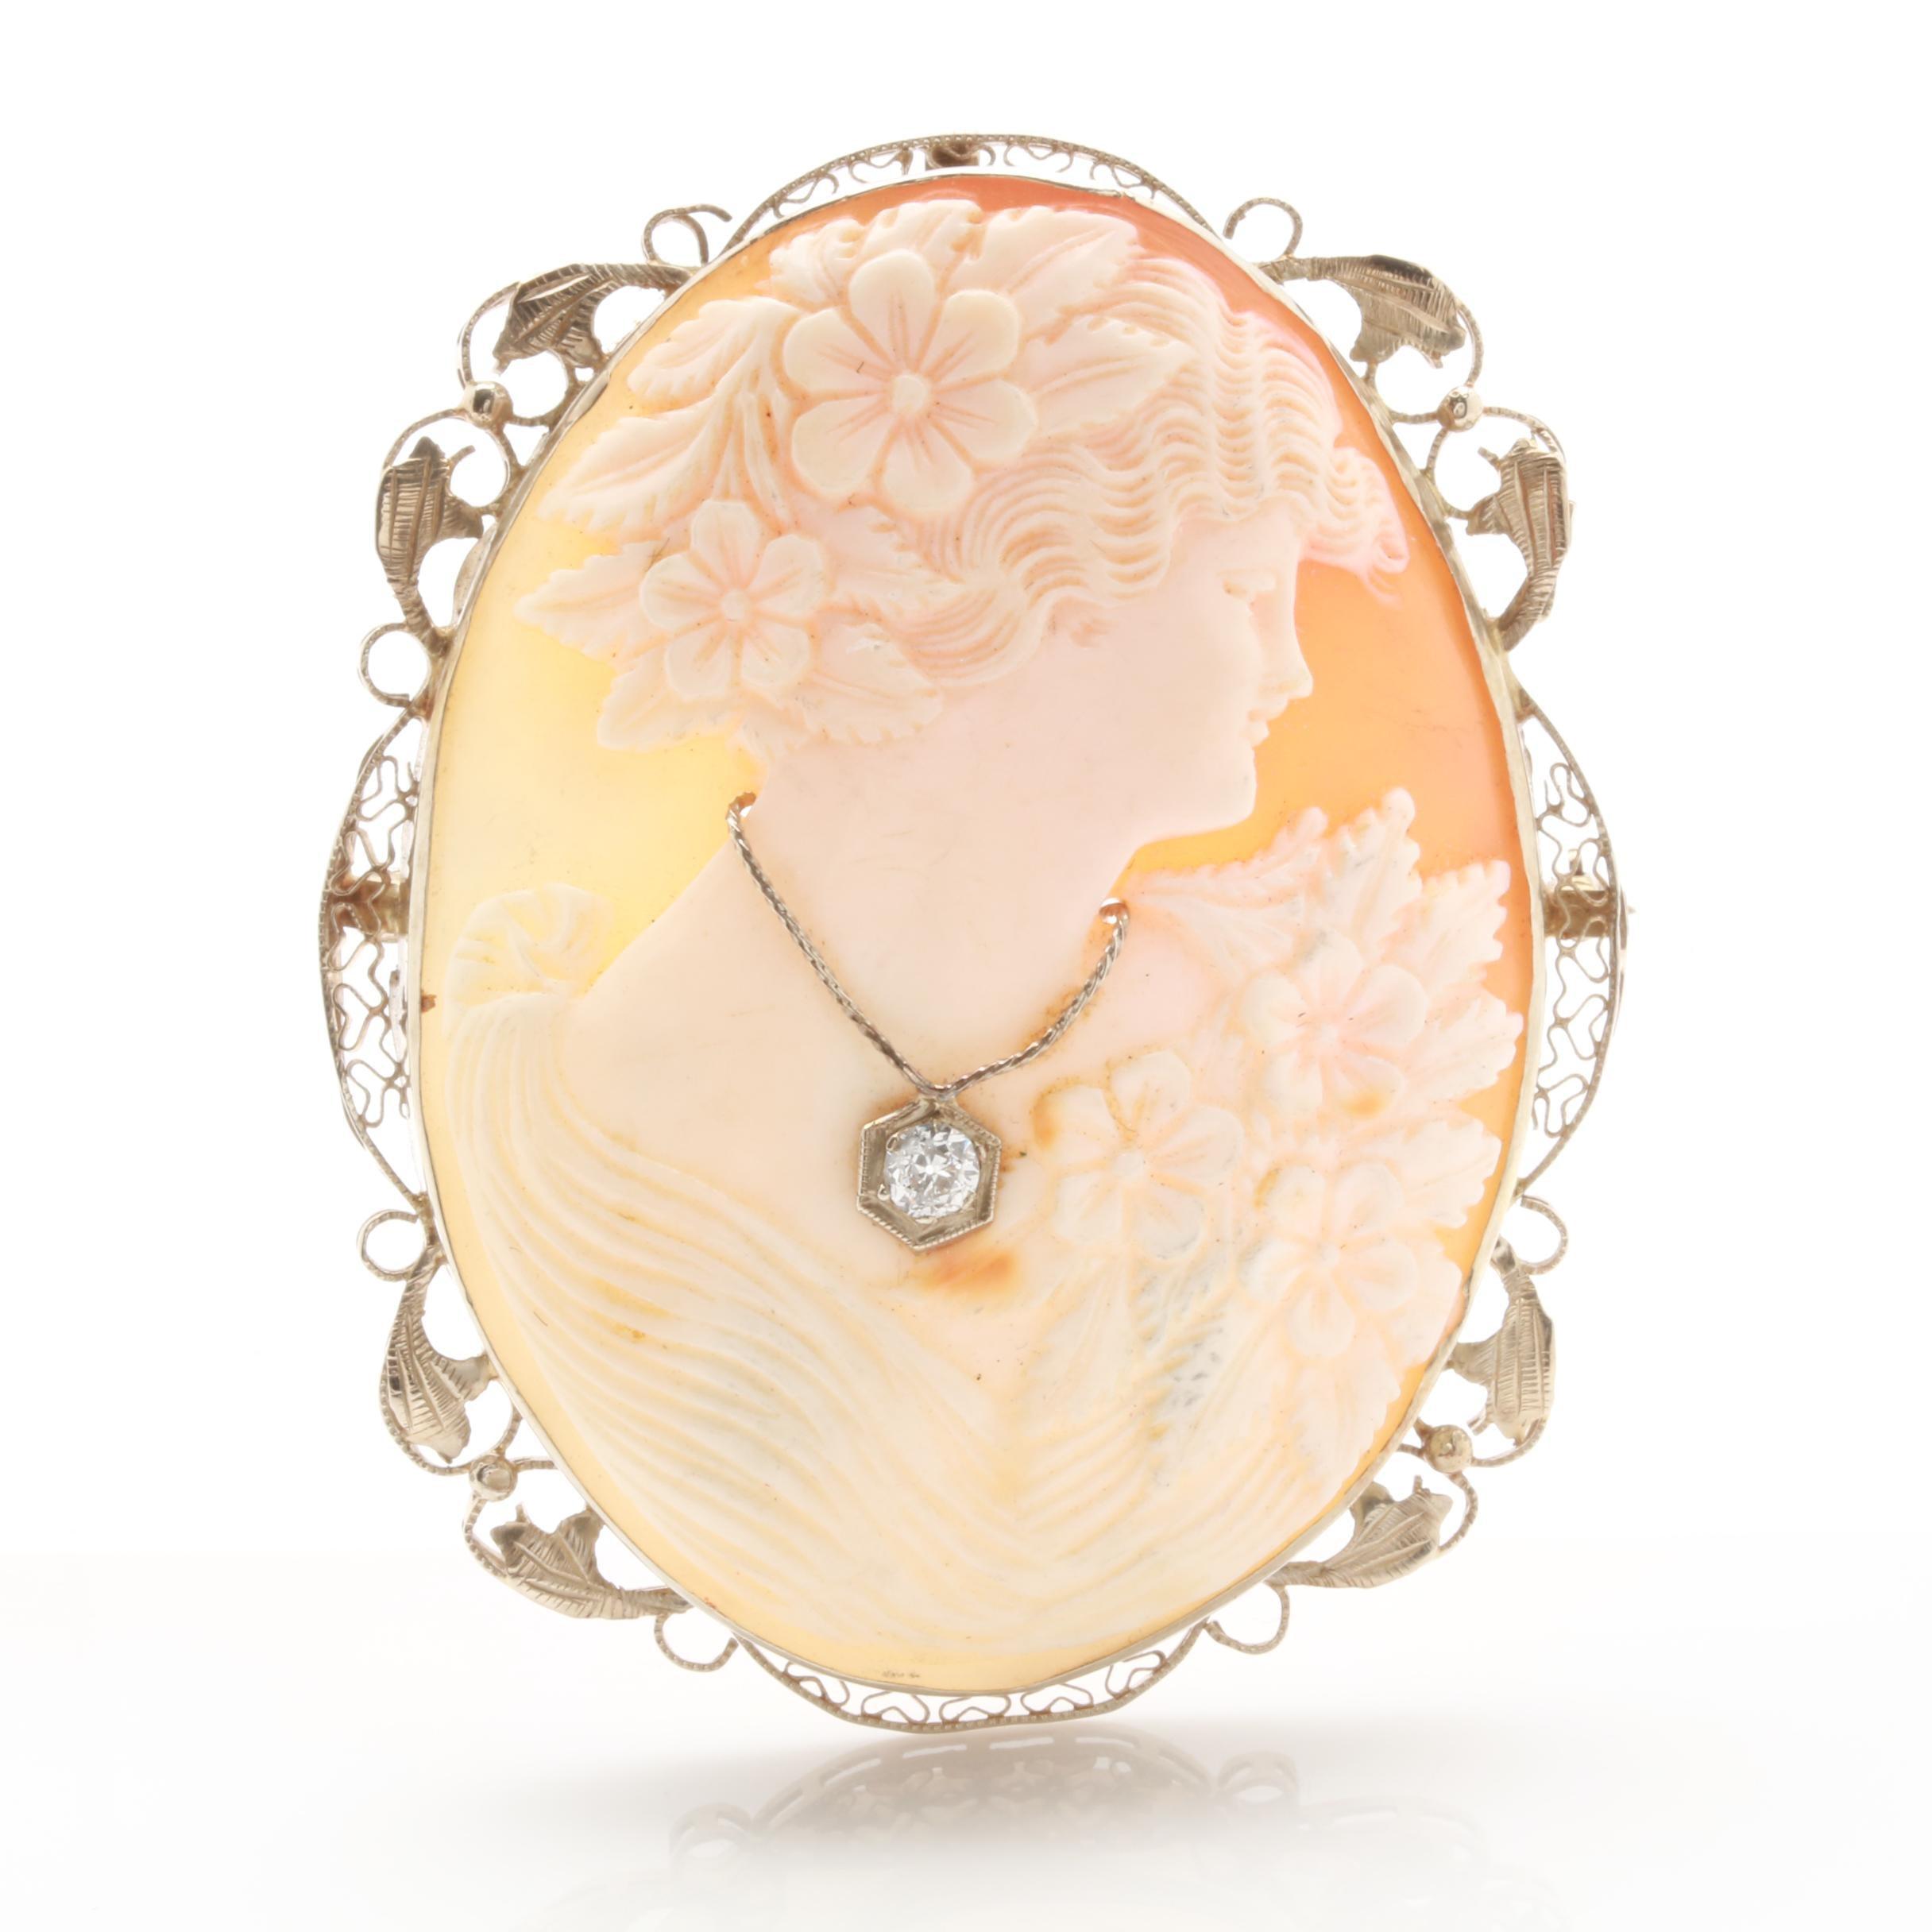 14K White Gold Shell and Diamond Cameo Habillé Converter Brooch